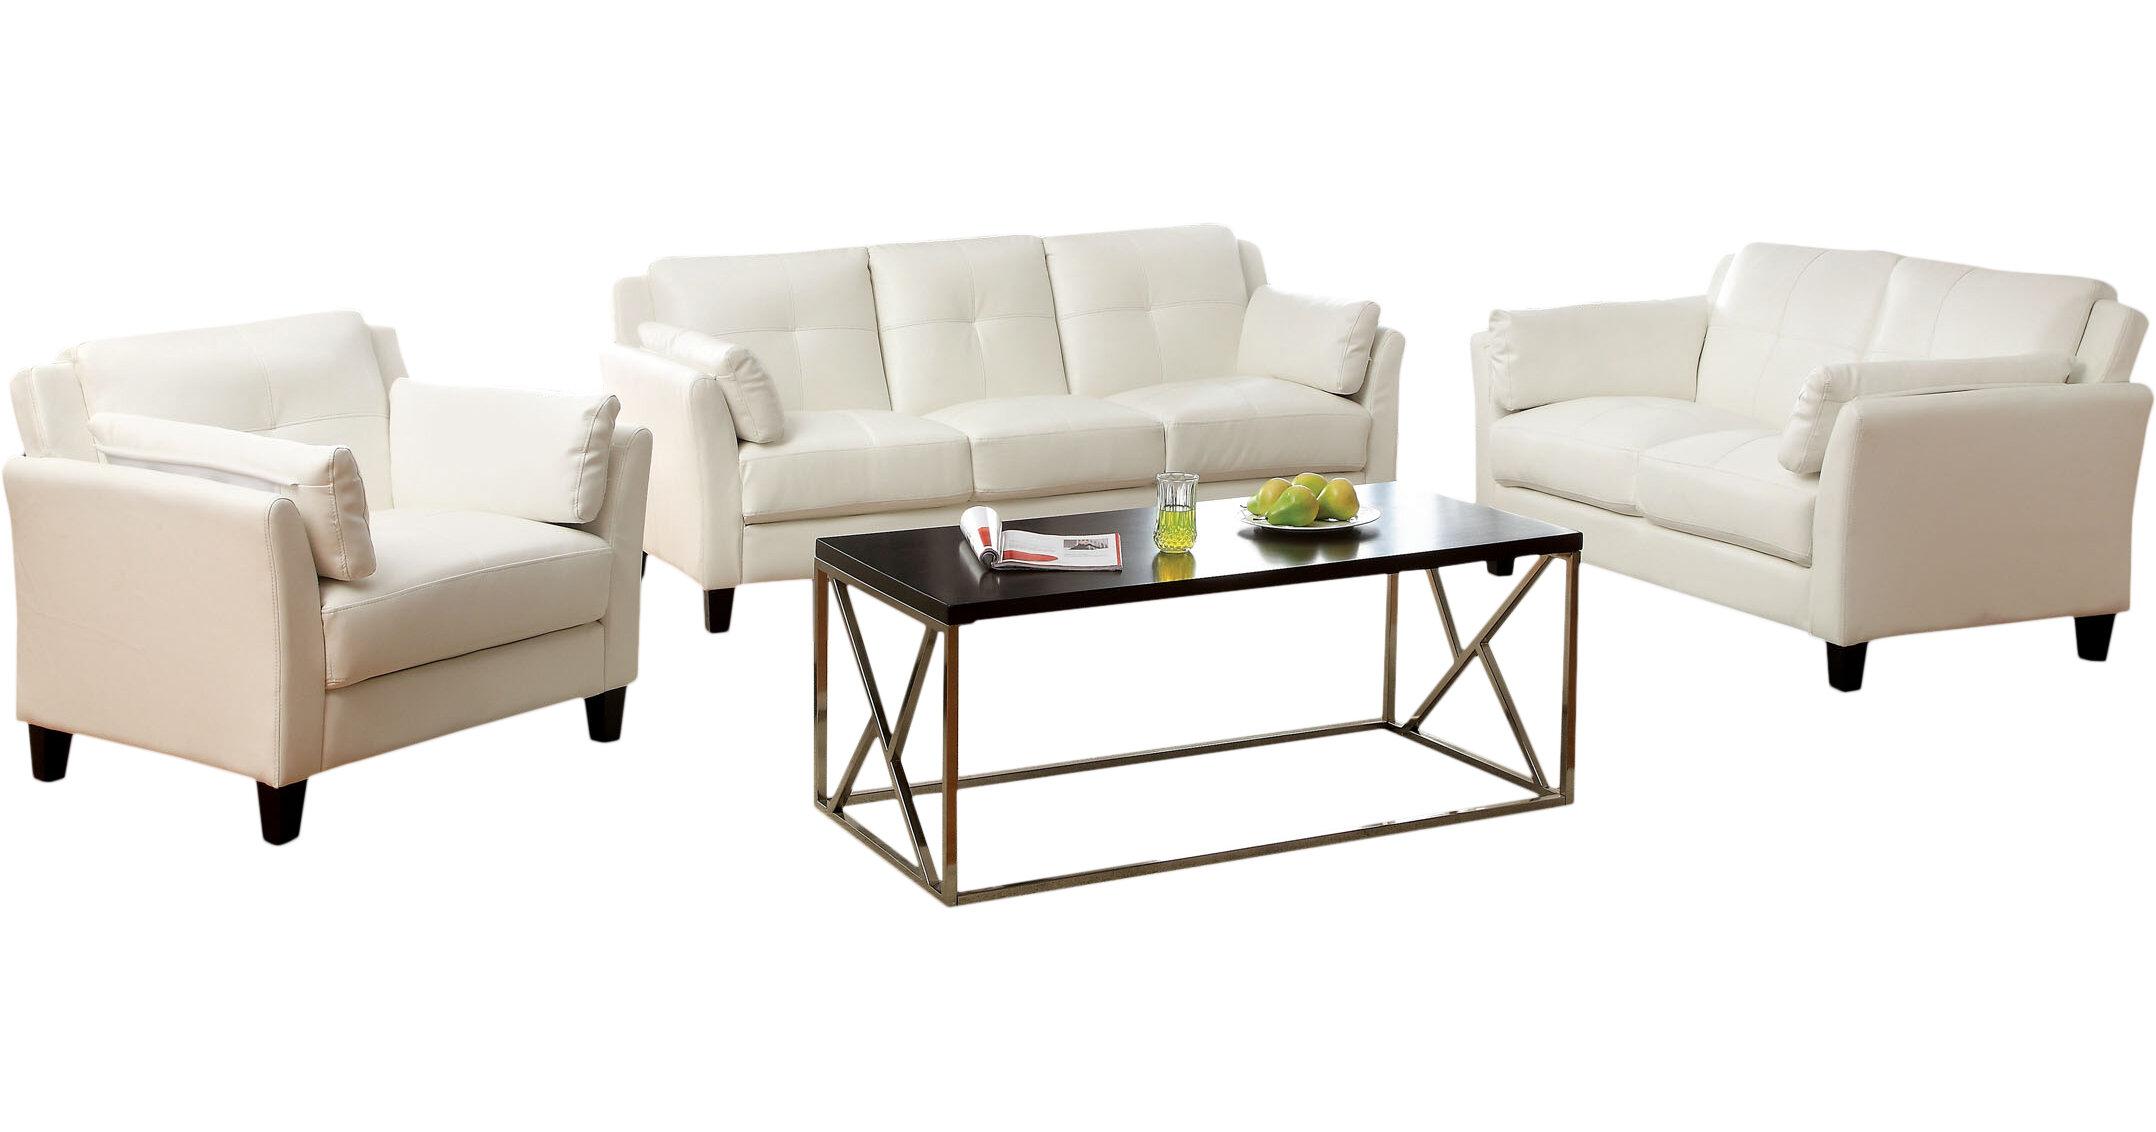 Hokku Designs Drevan Configuration Living Room Set & Reviews | Wayfair